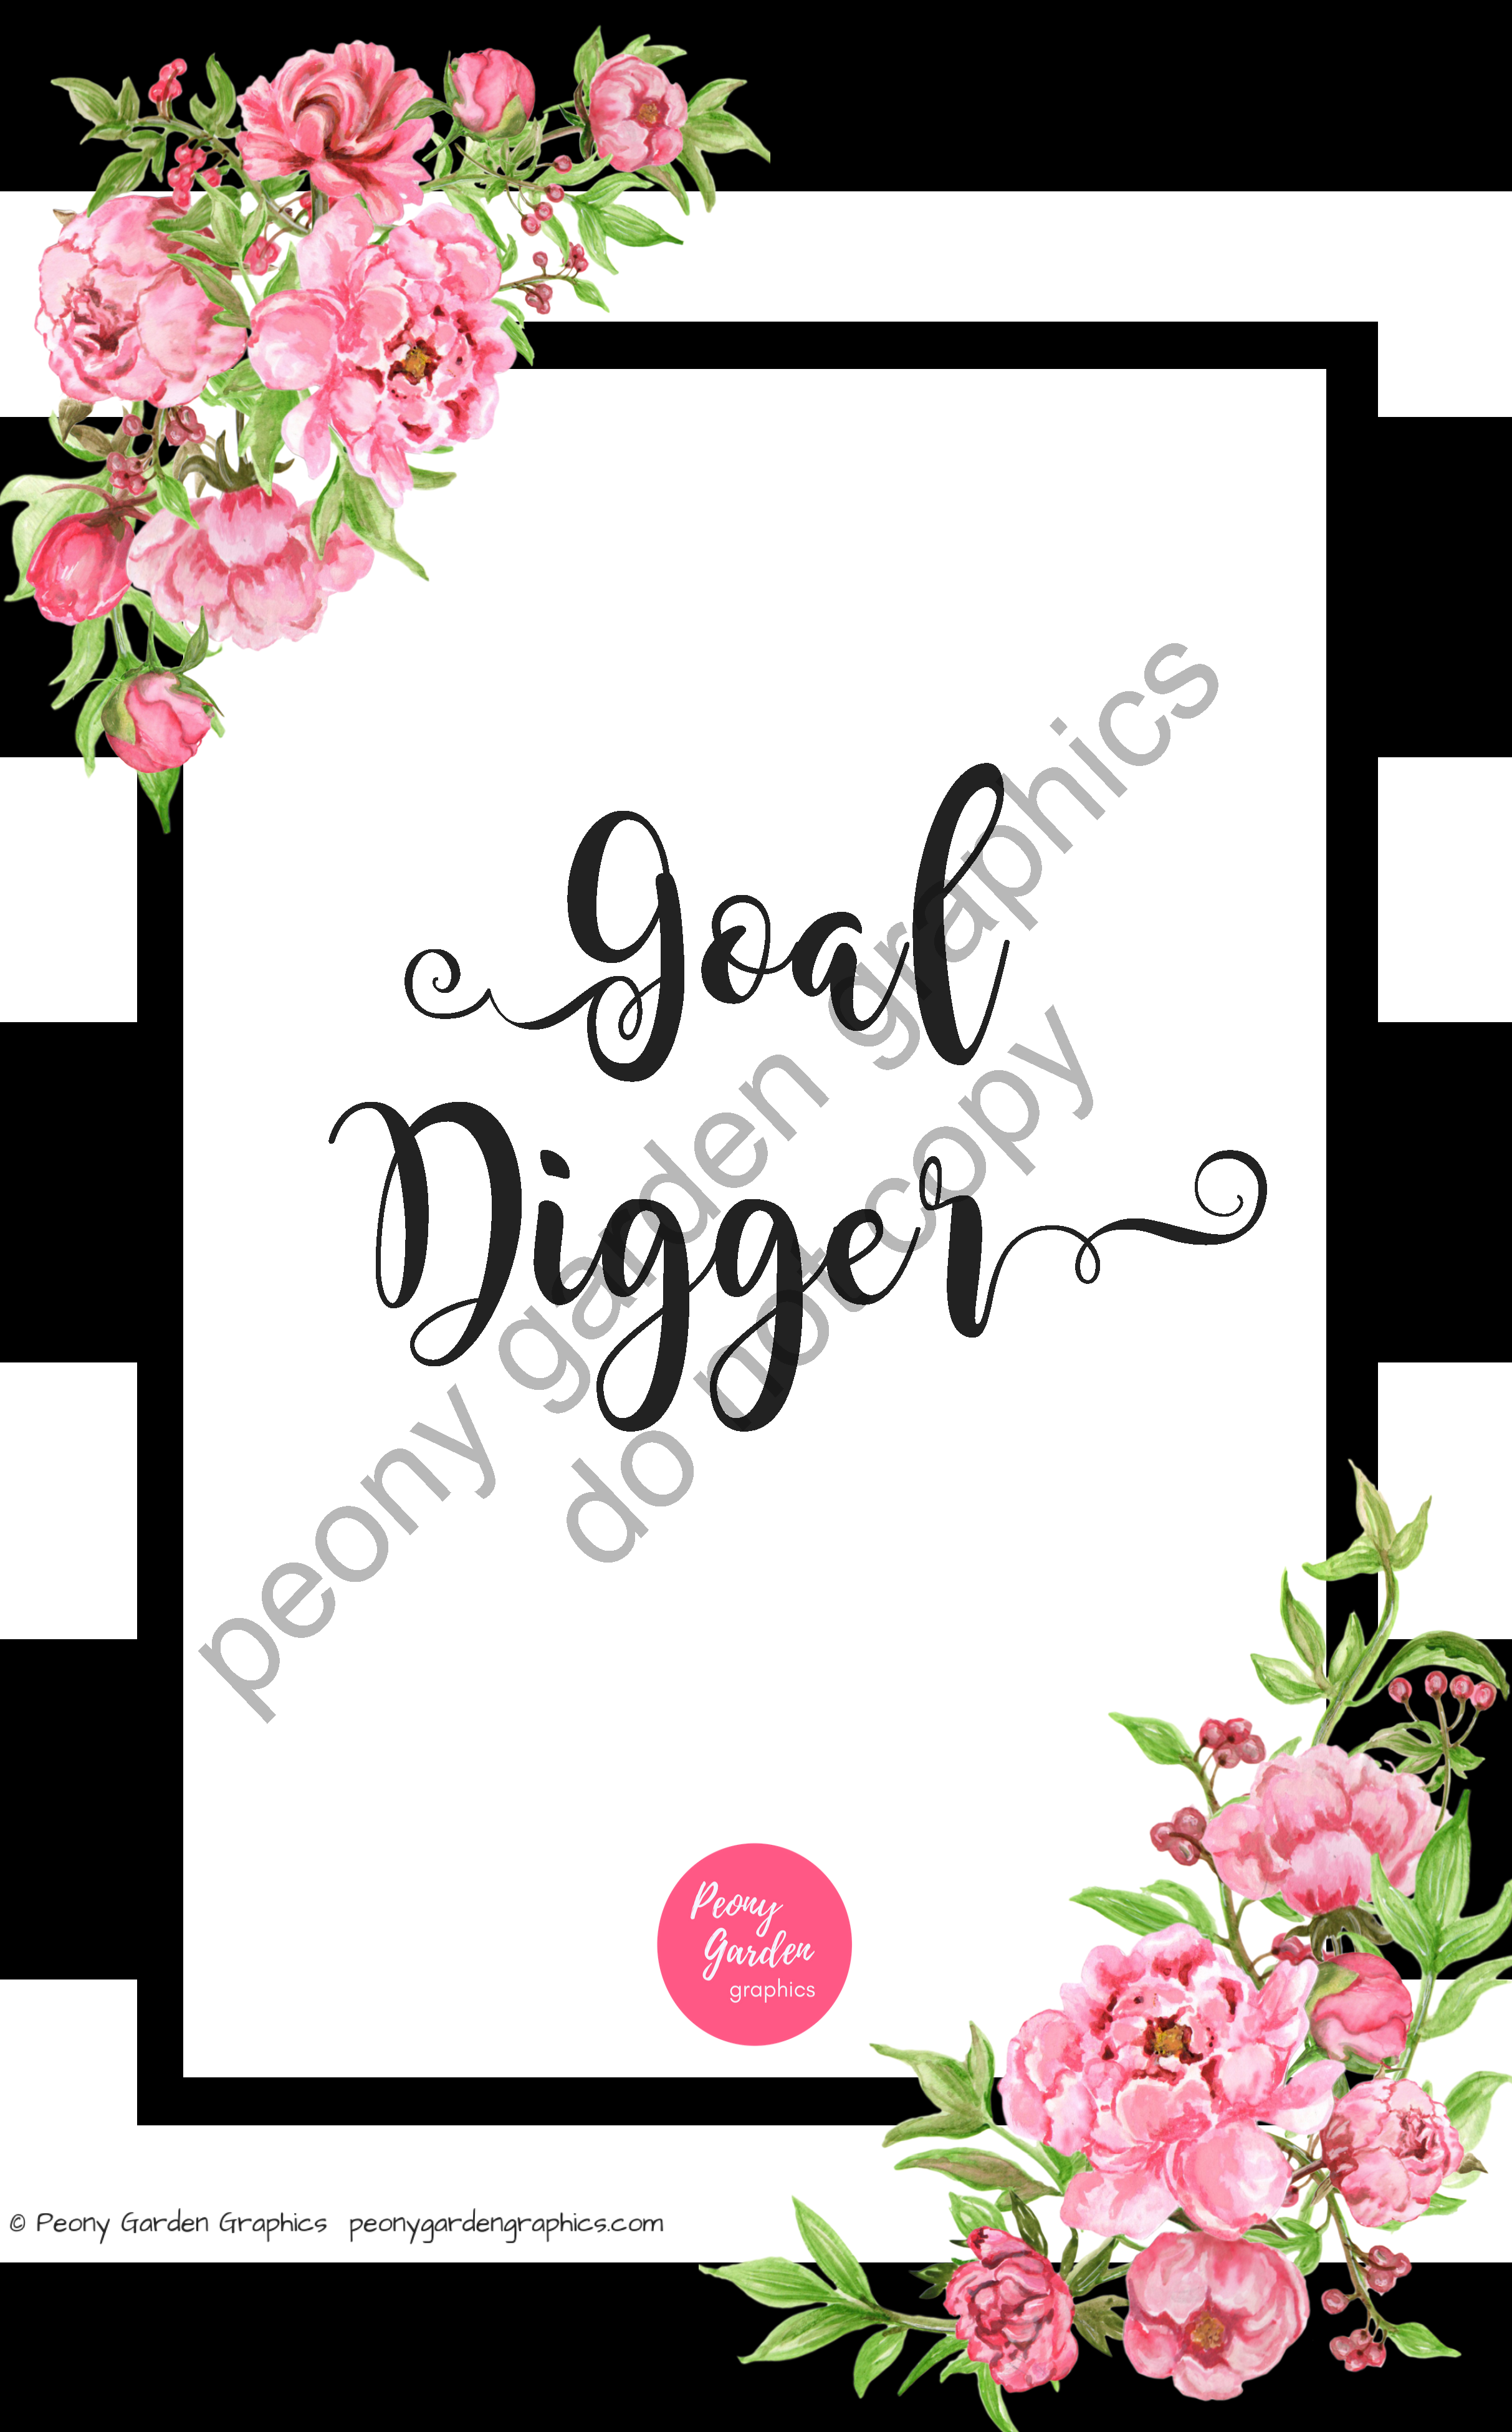 Planner Mon-LPV-Goals | PeonyGardenGraphics